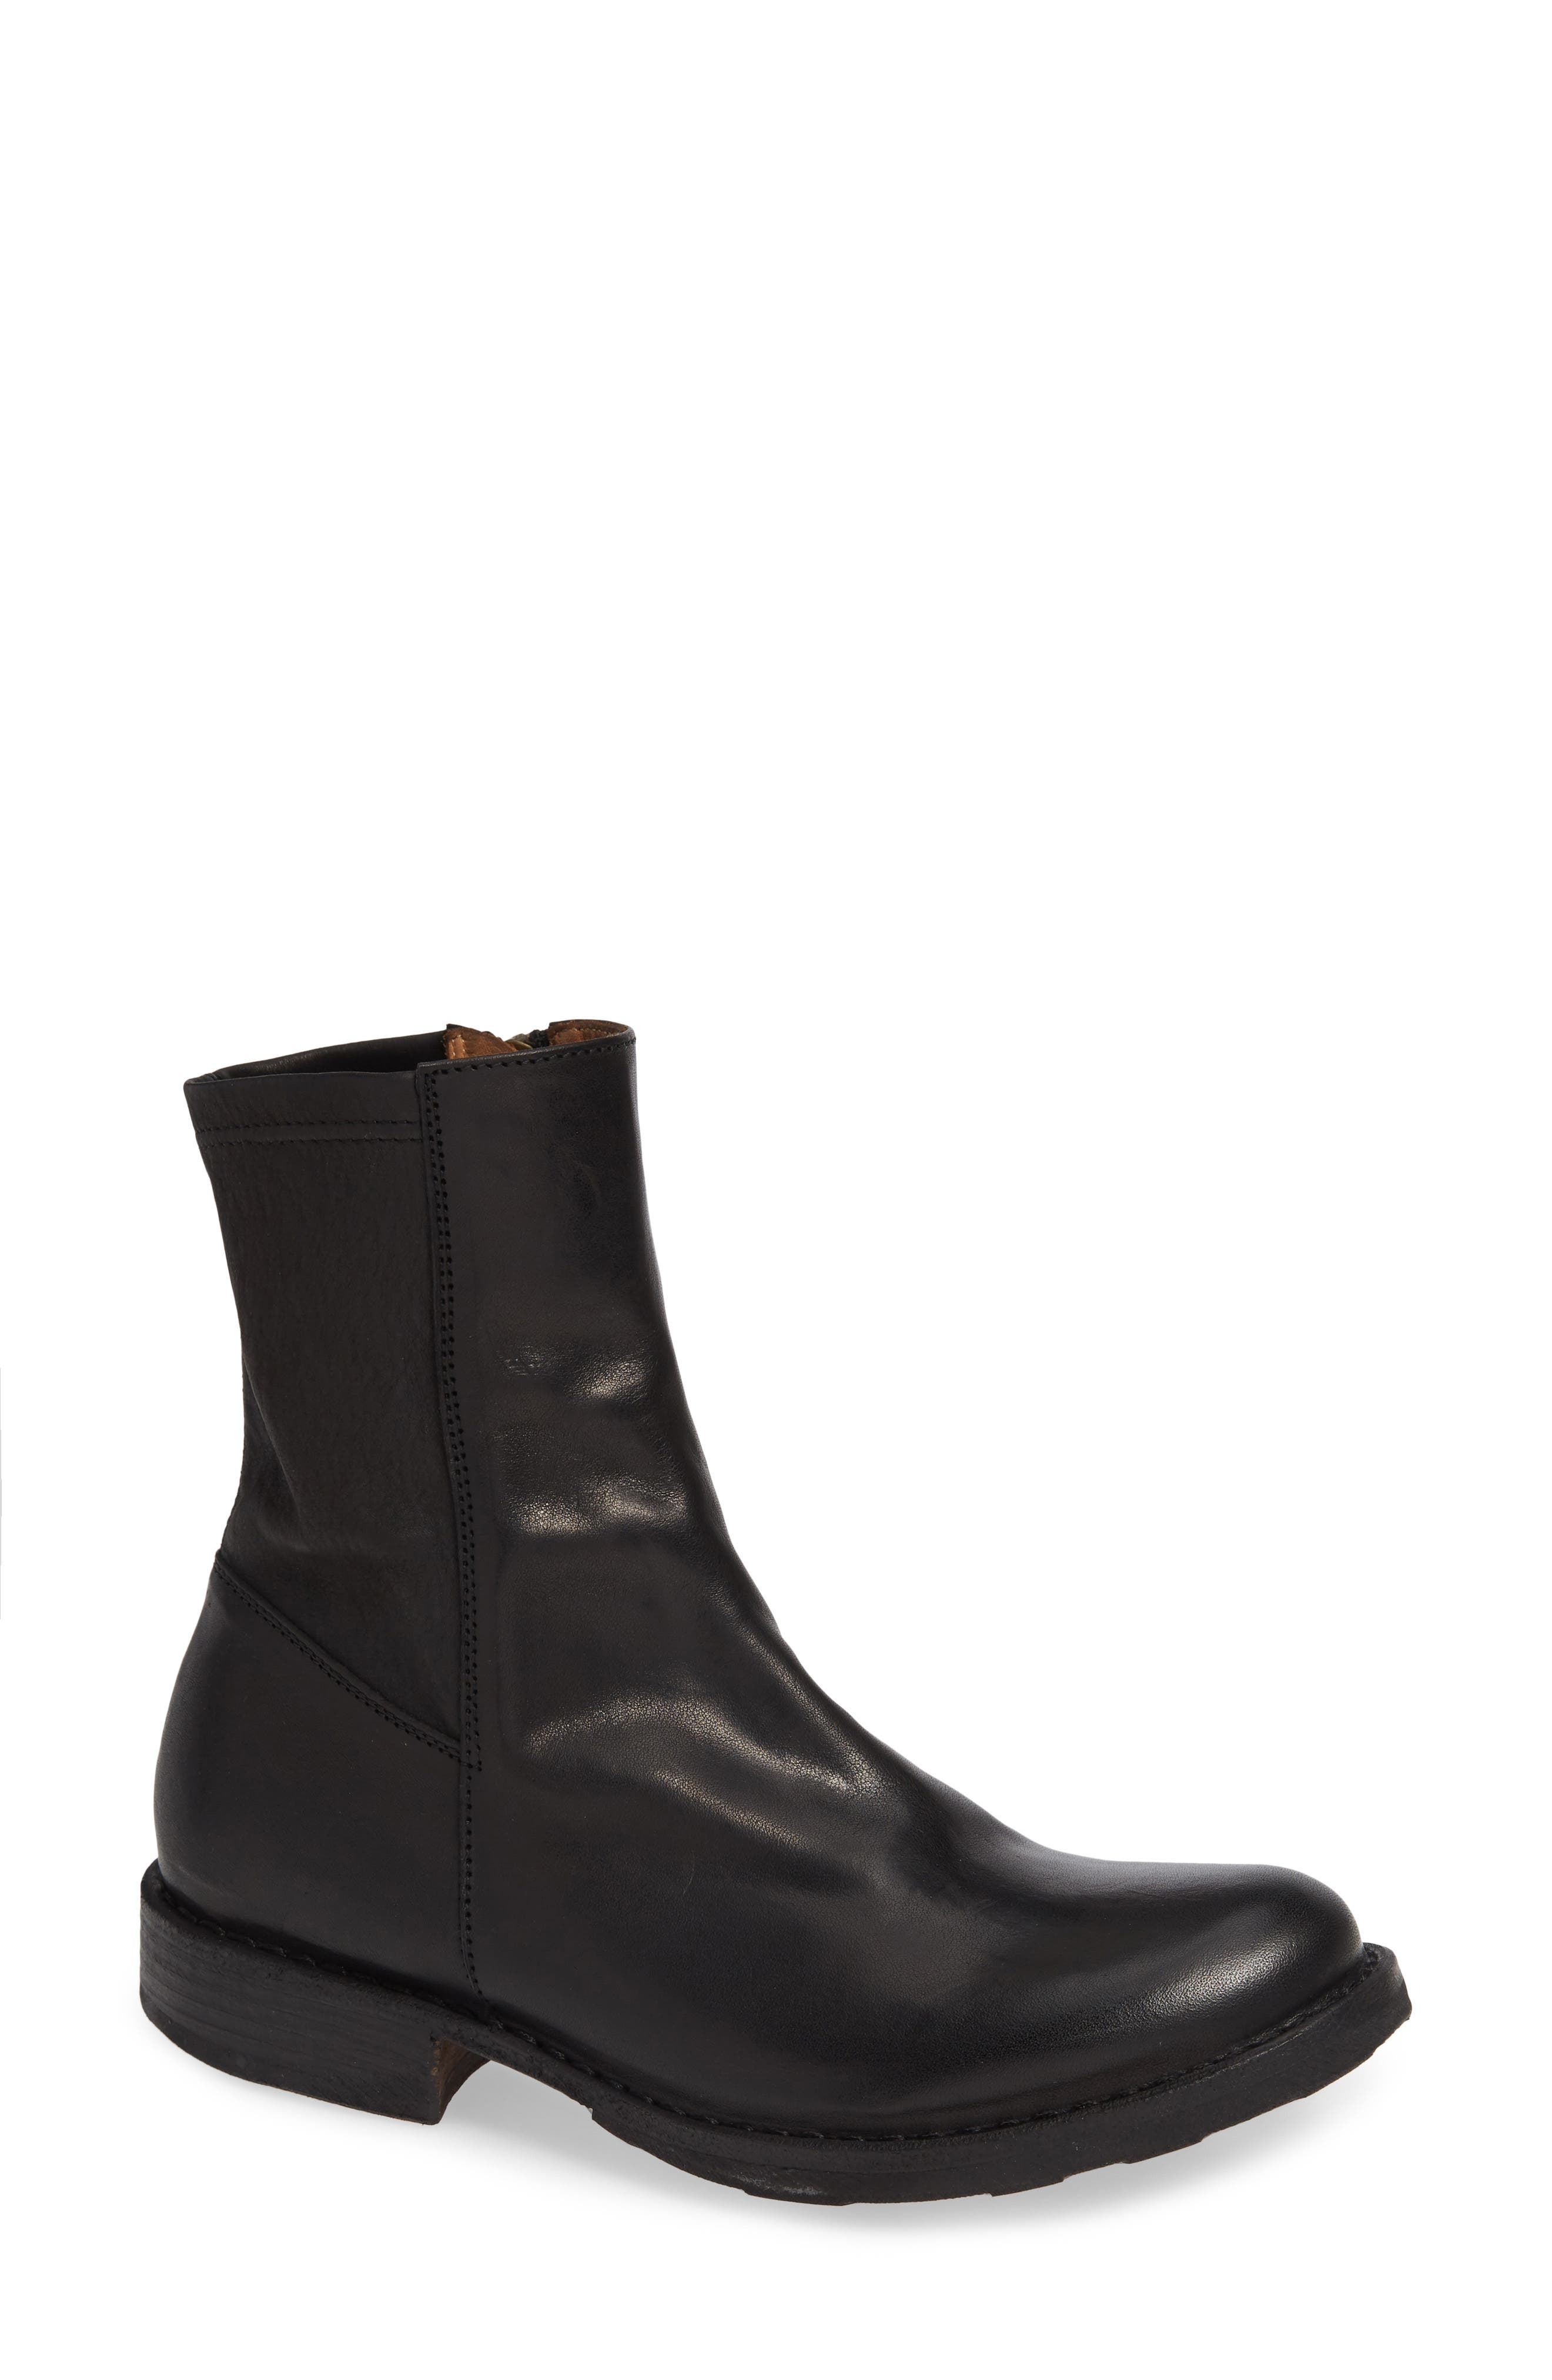 FIORENTINI + BAKER Ebe Boot in Black Leather